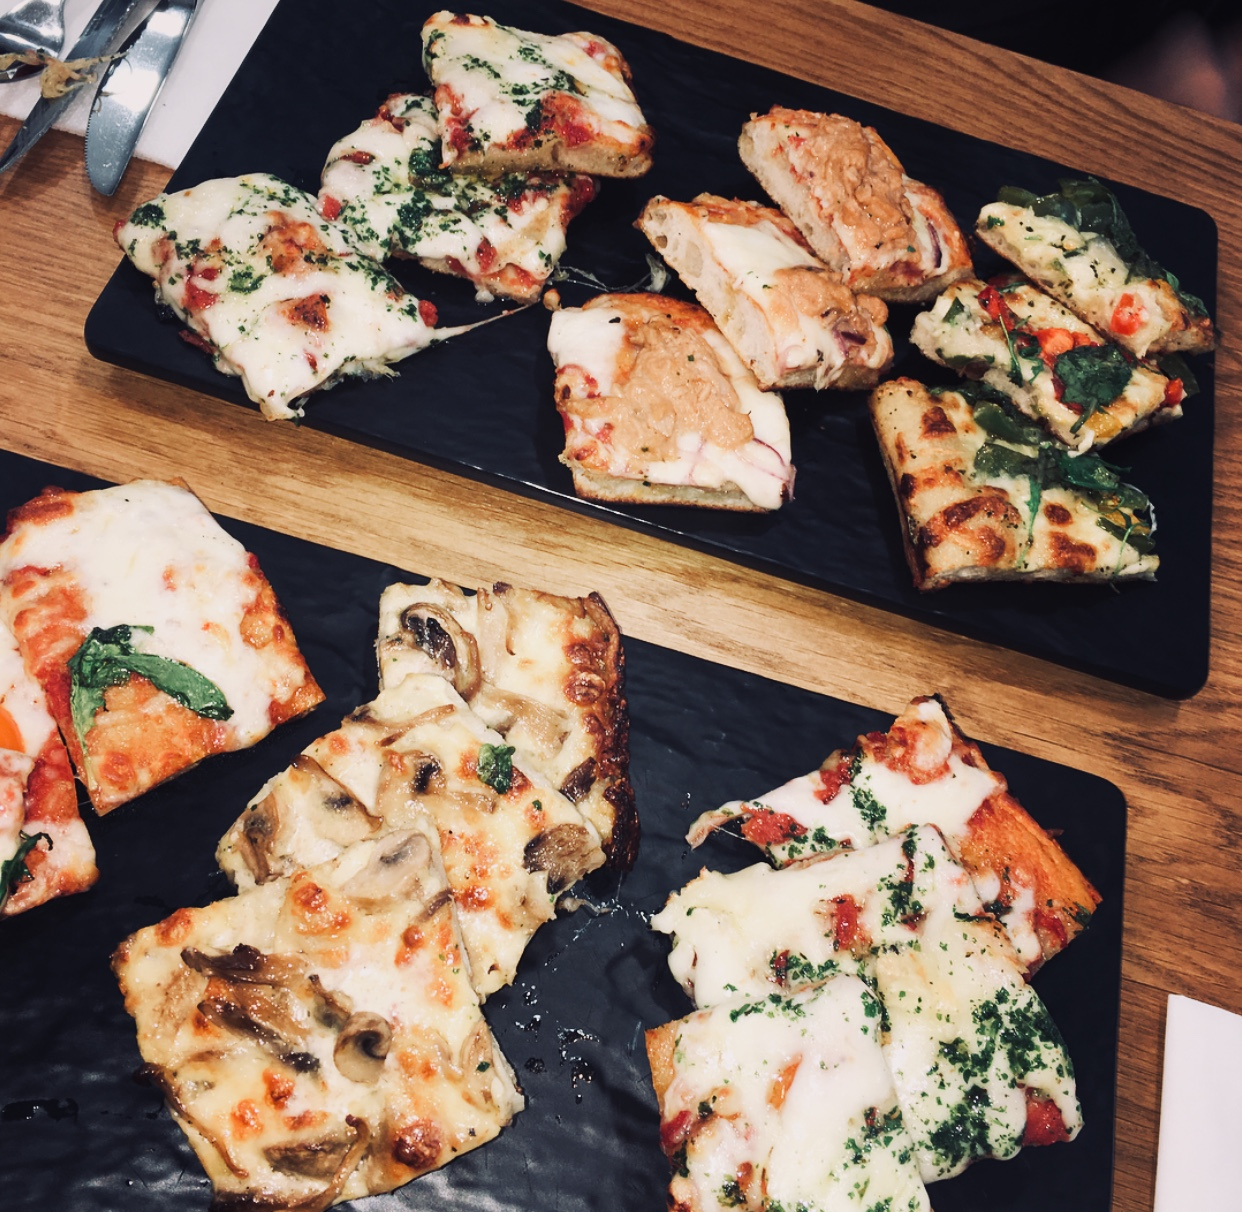 Pizzas recette originale - Pizzeria cacher - Itaglio